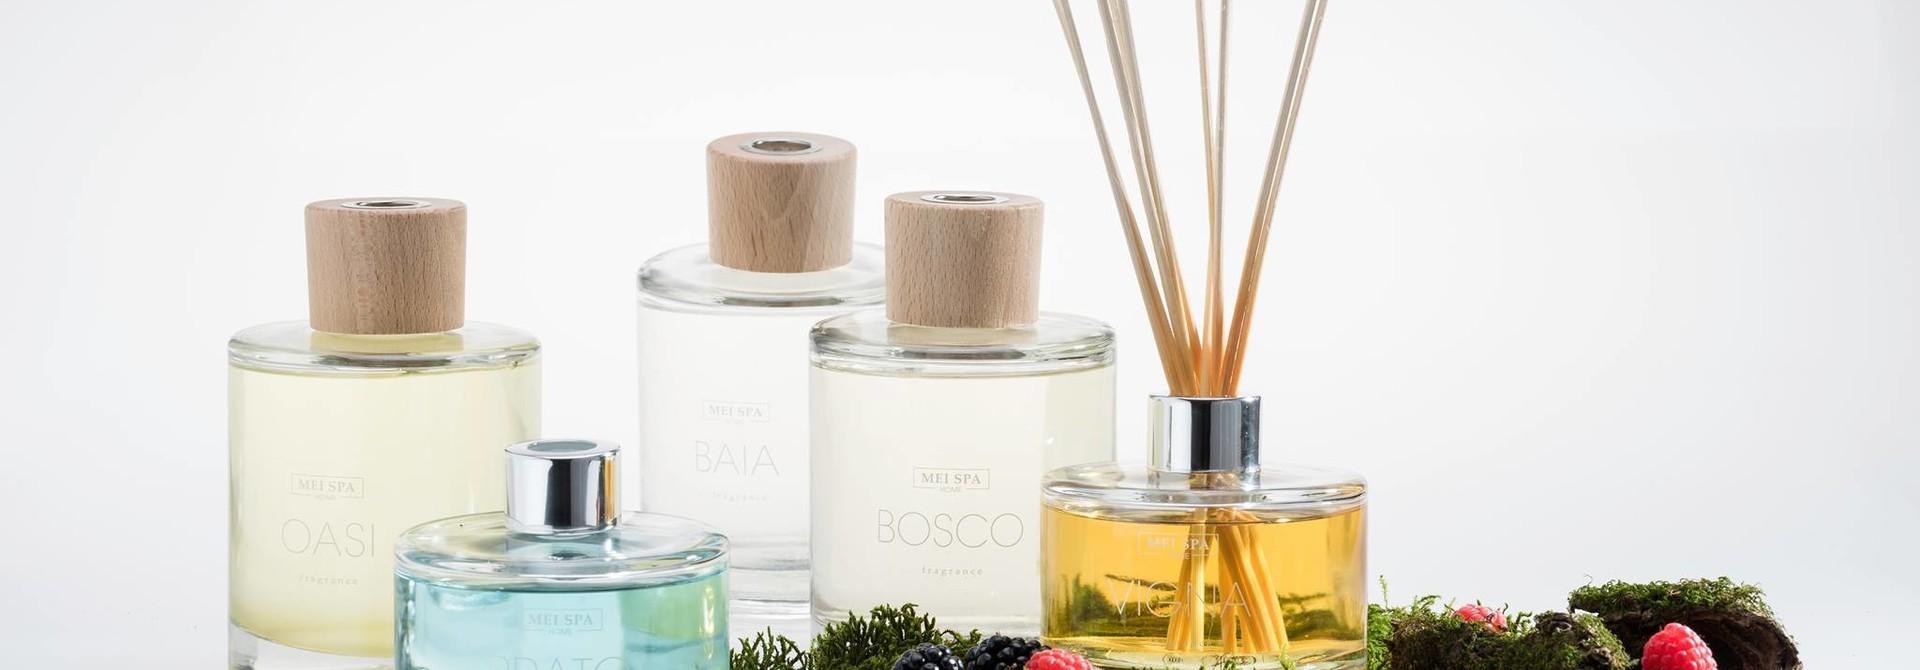 MEI SPA Home - BOSCO Huisparfum